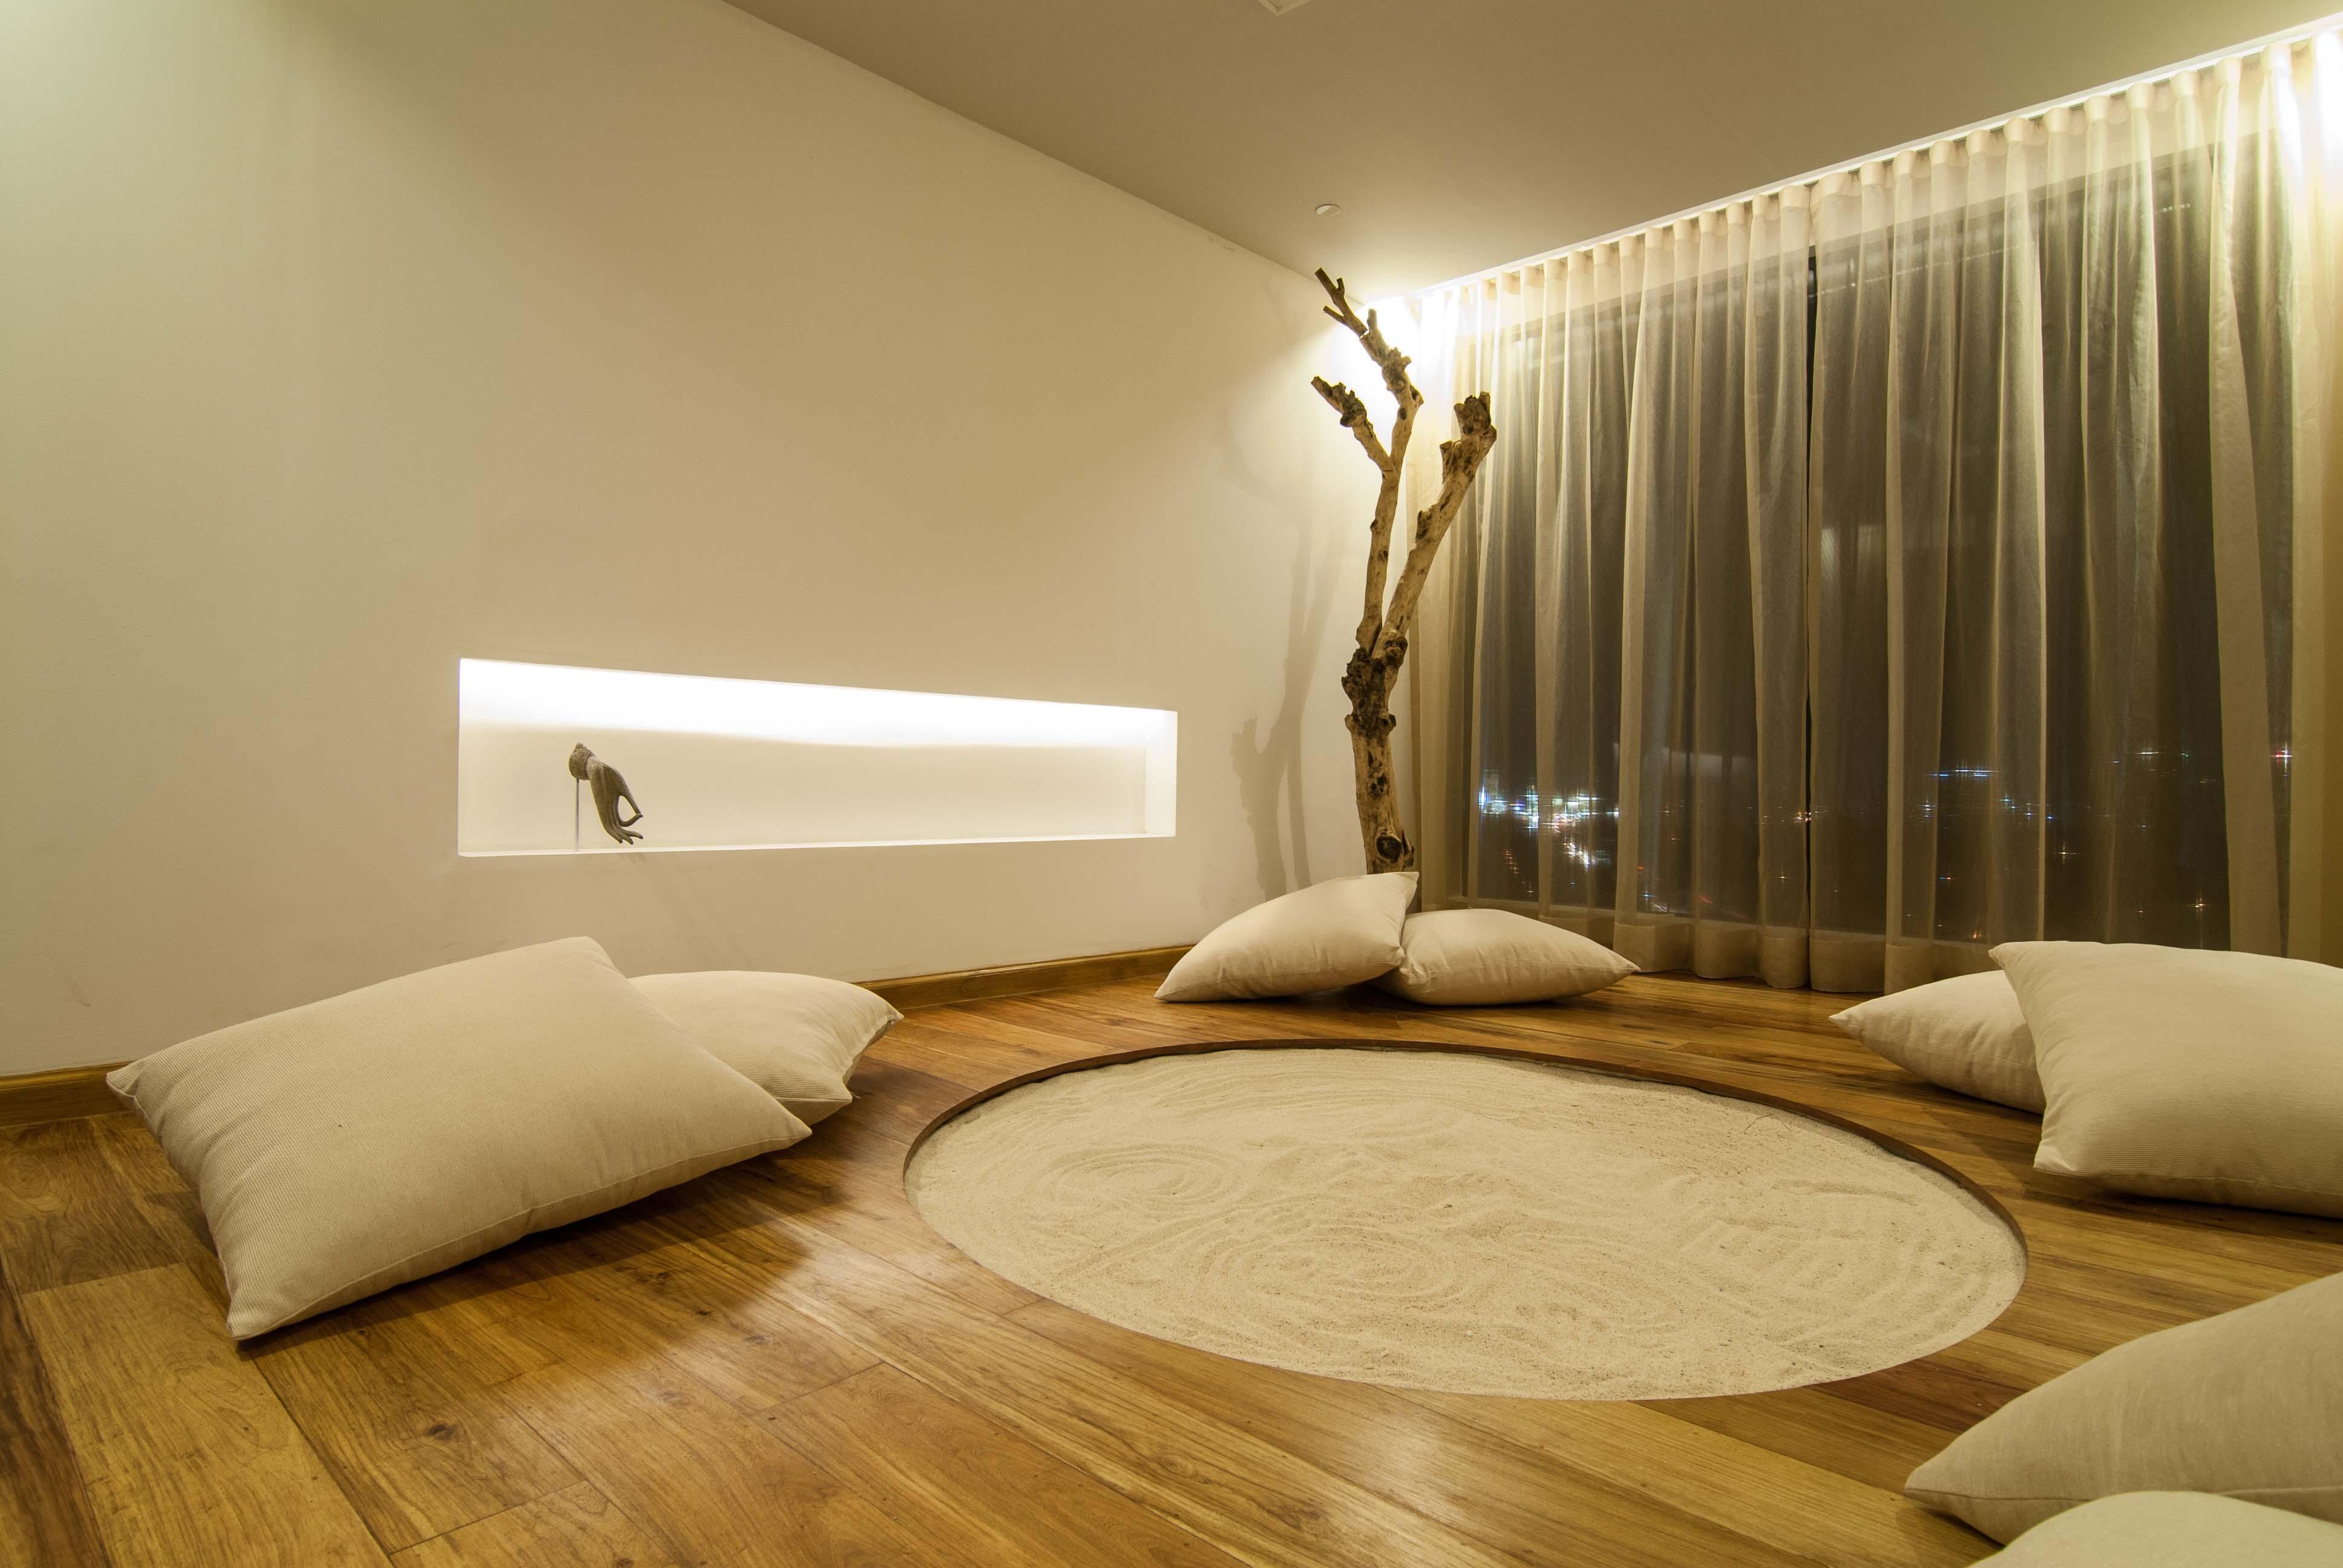 Meditation Room Decorating Ideas